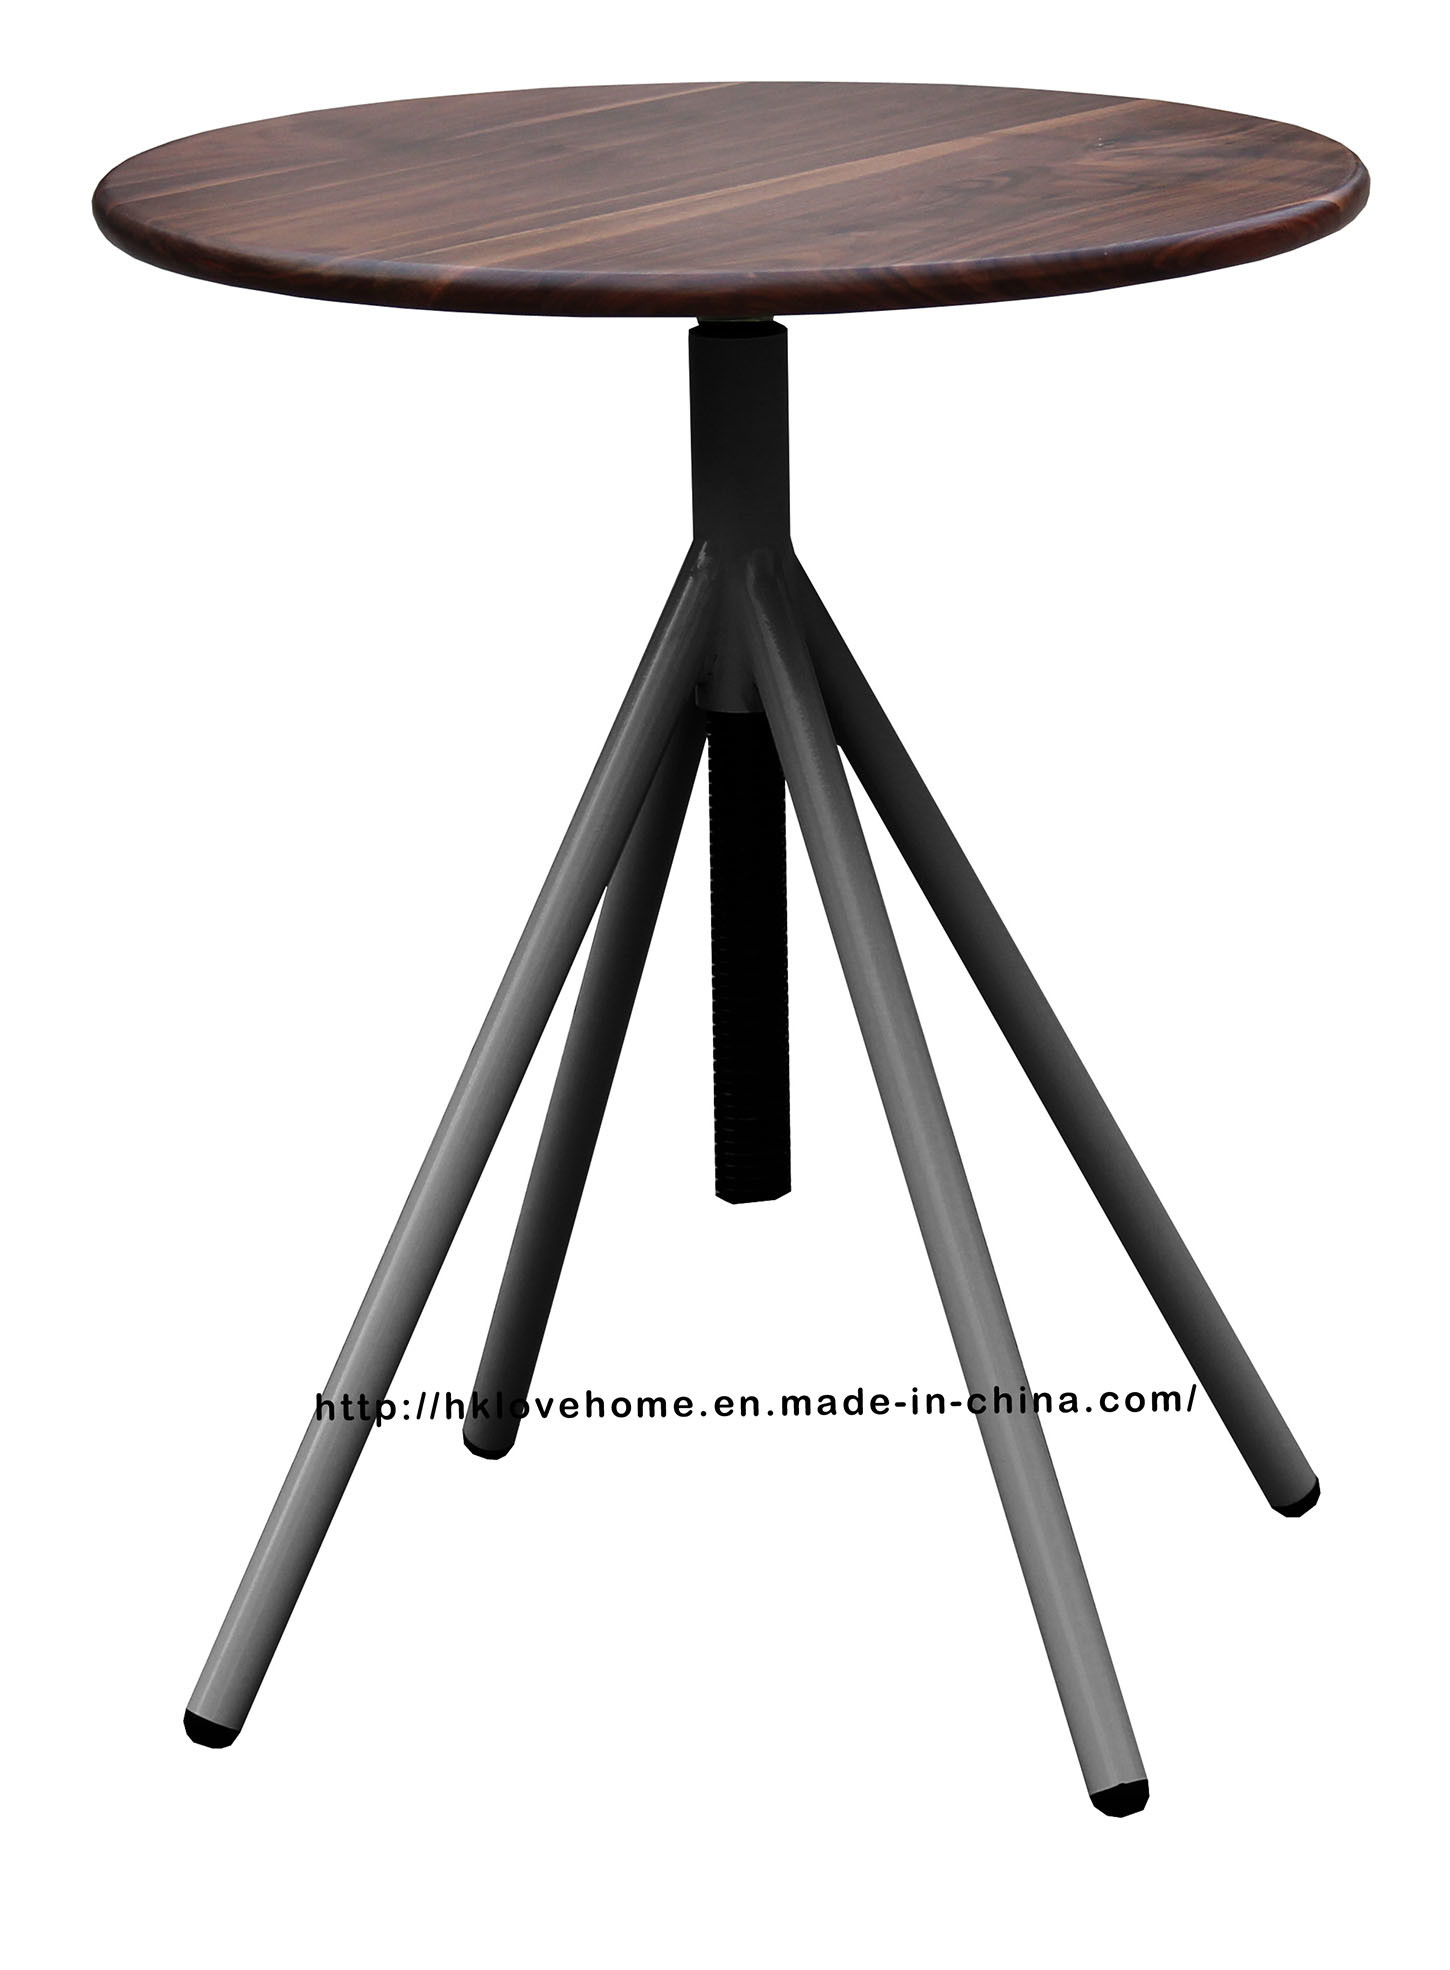 Industrial Metal Restaurant Wooden Vintage Swivel Dining Table